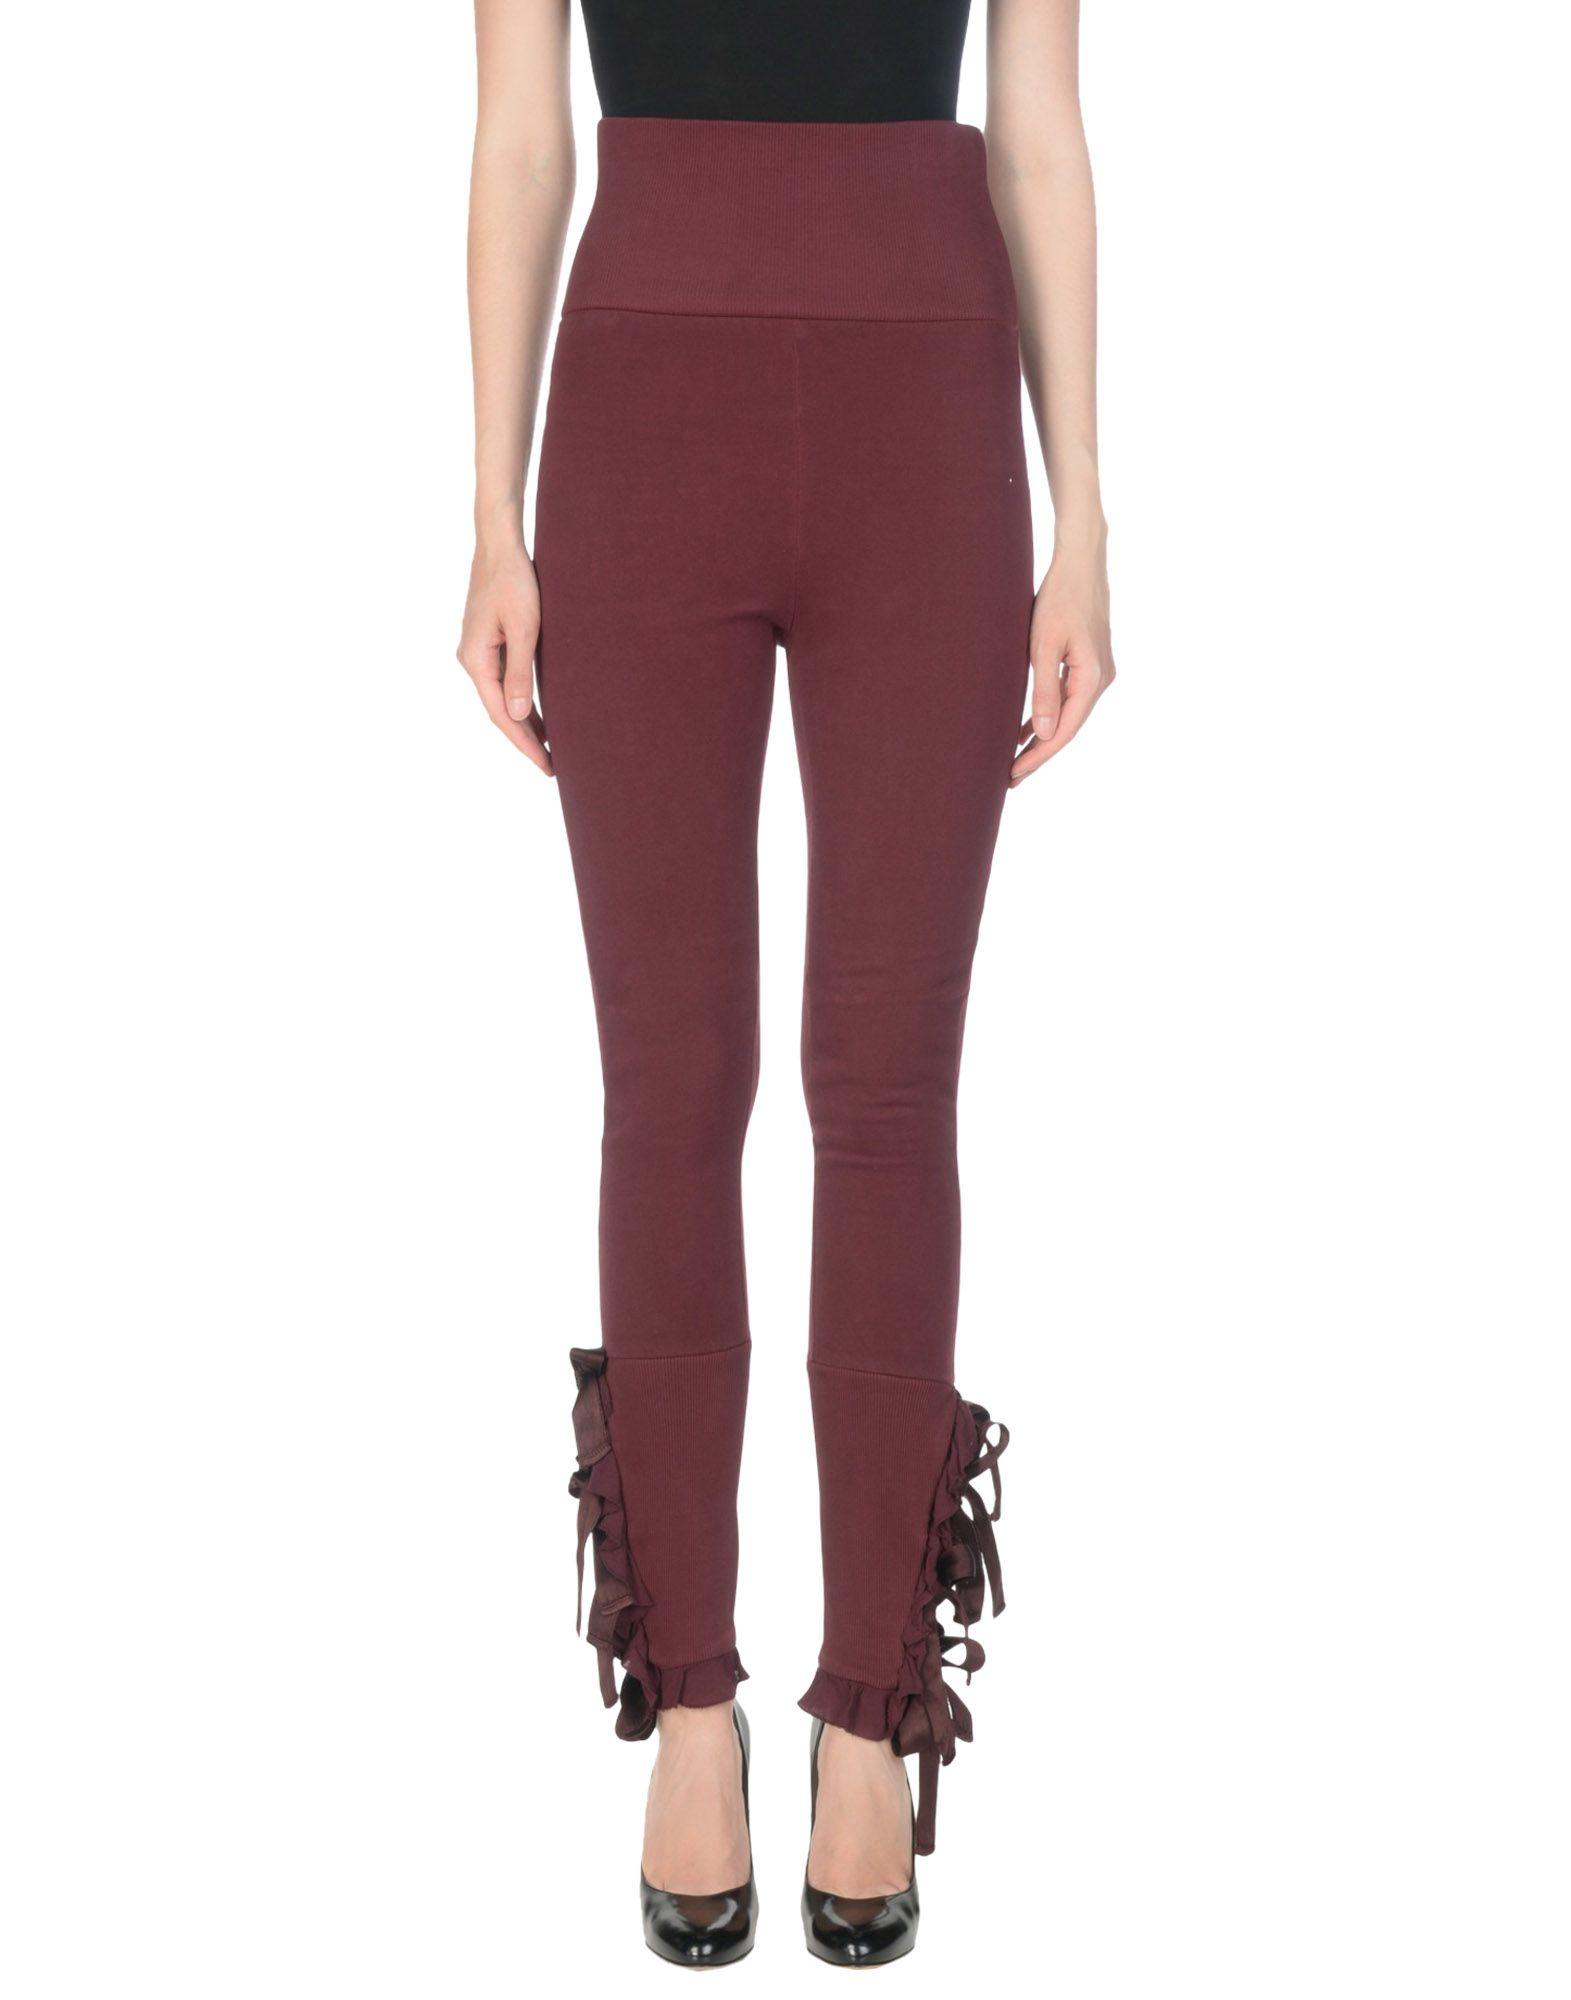 Pantalone Brognano donna - 13180644QM 13180644QM  zu verkaufen